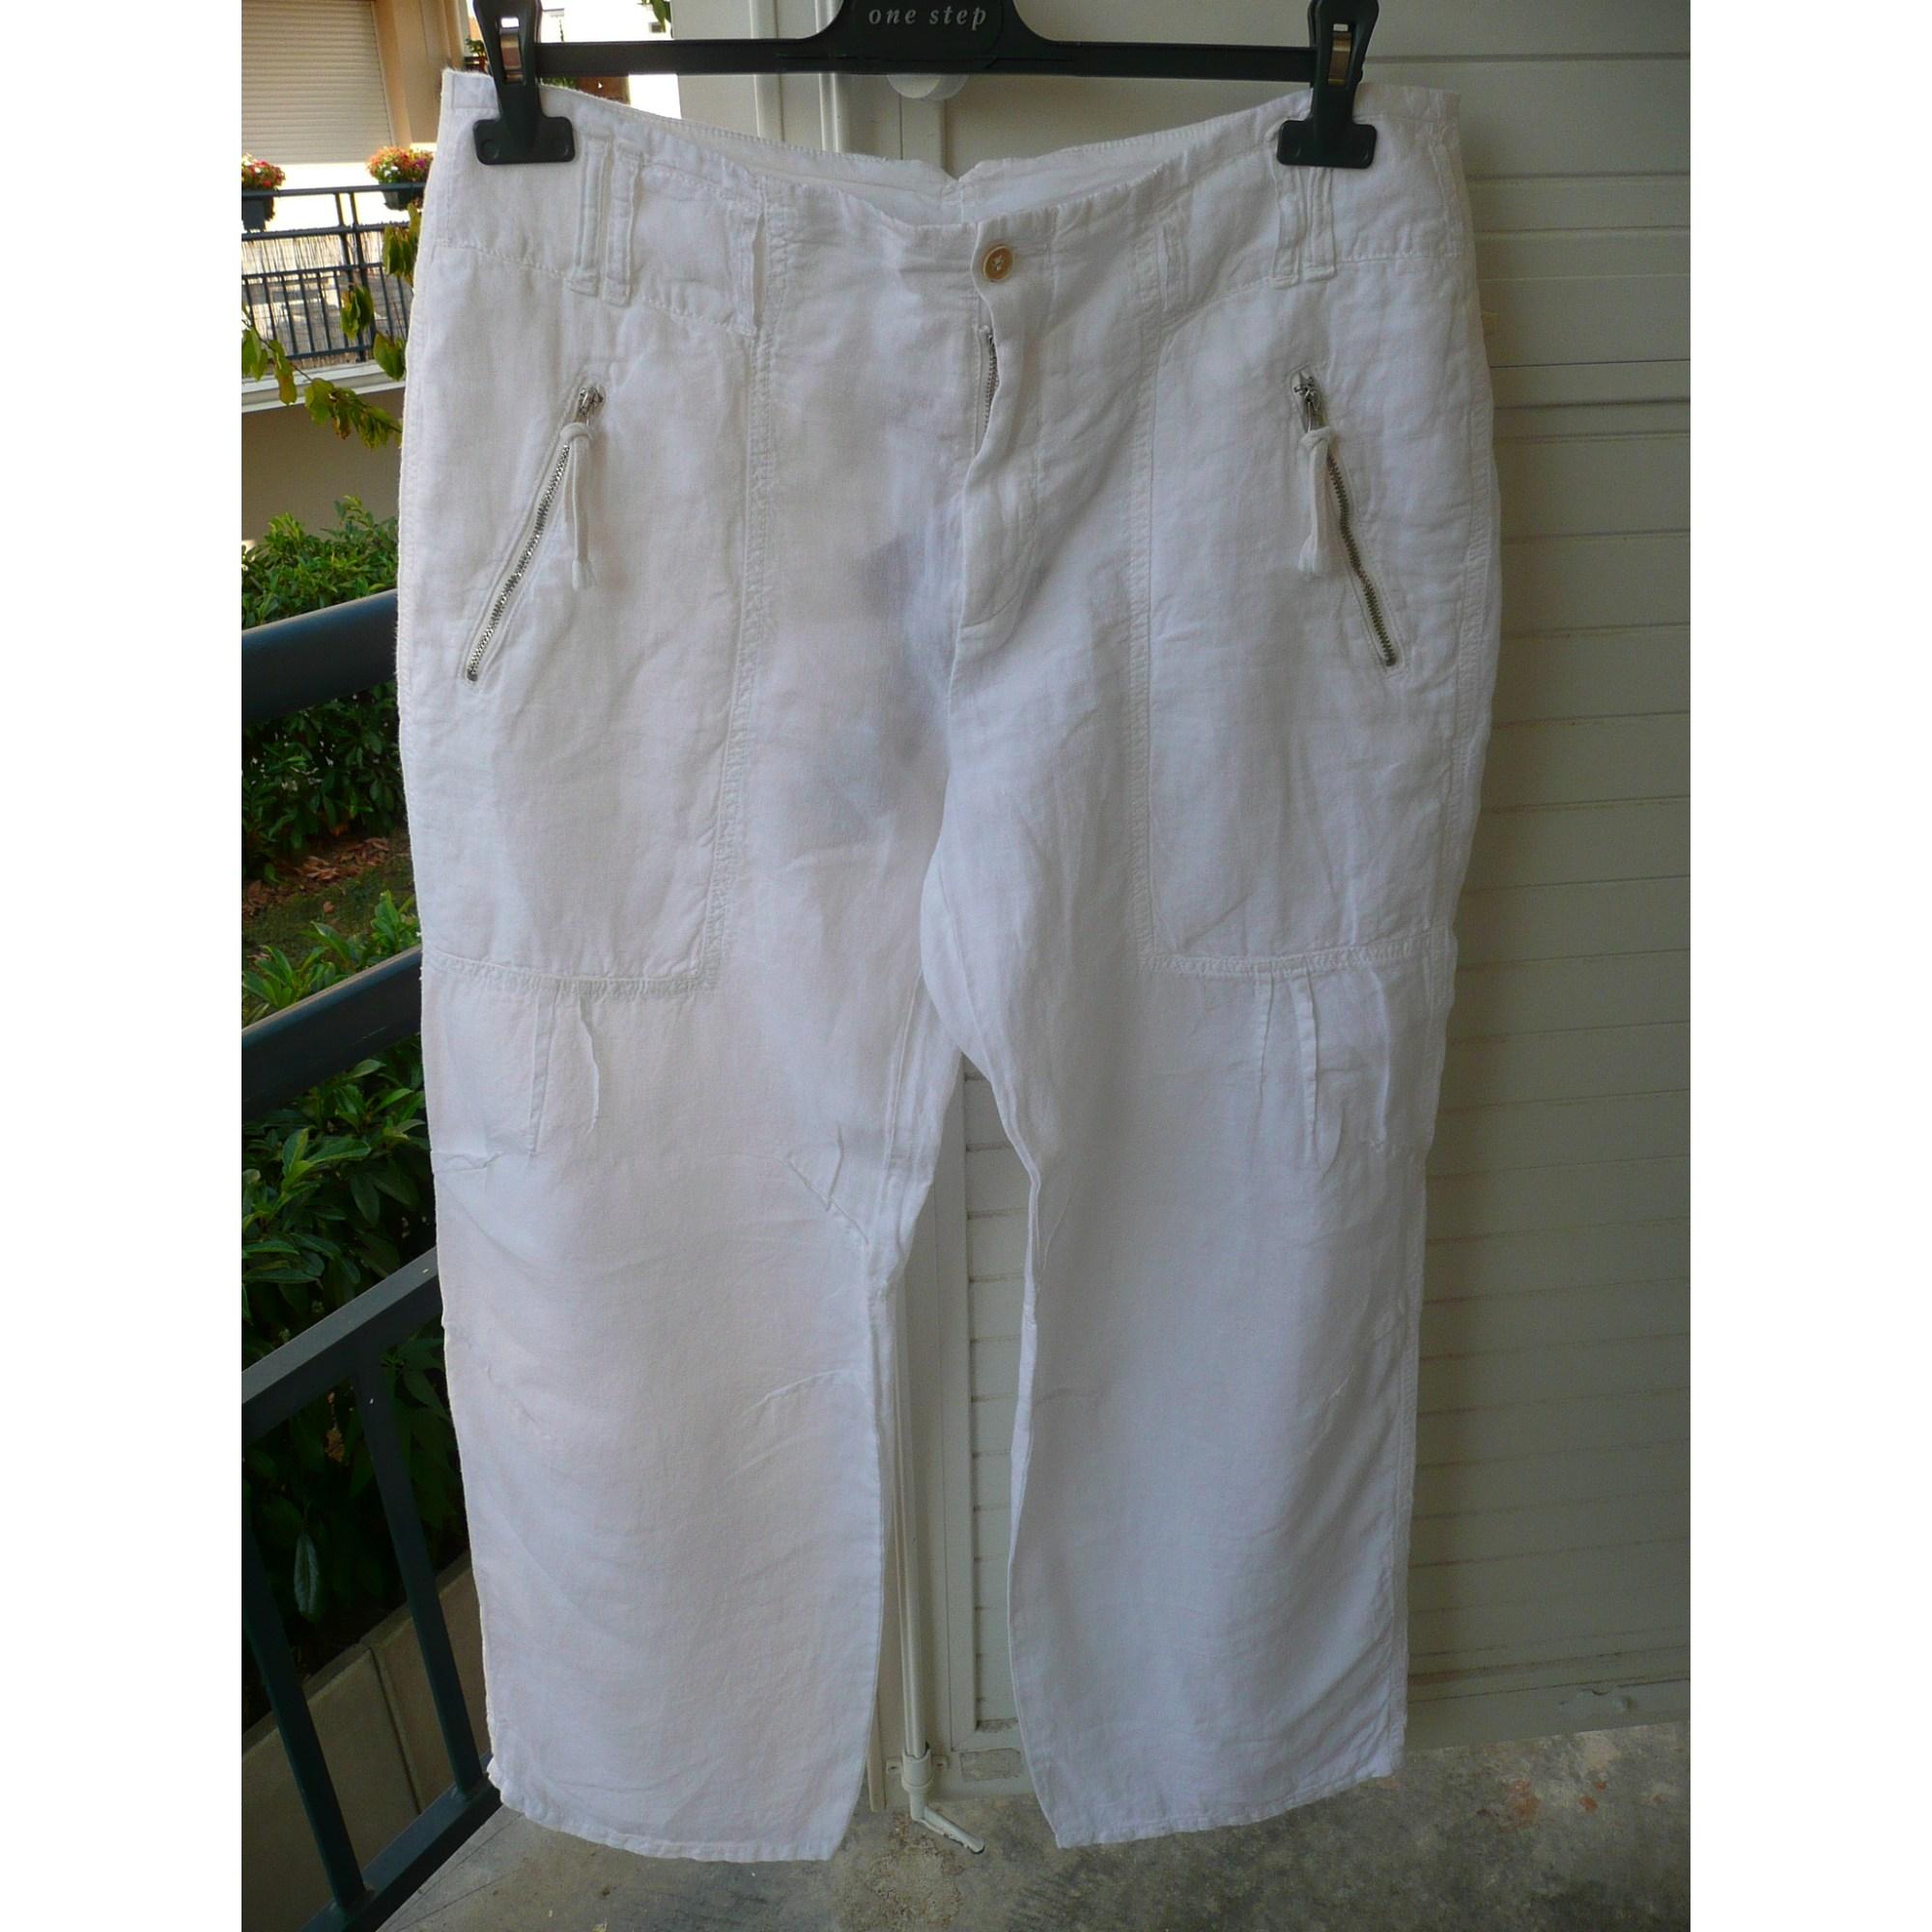 Pantalon large ONE STEP Blanc, blanc cassé, écru